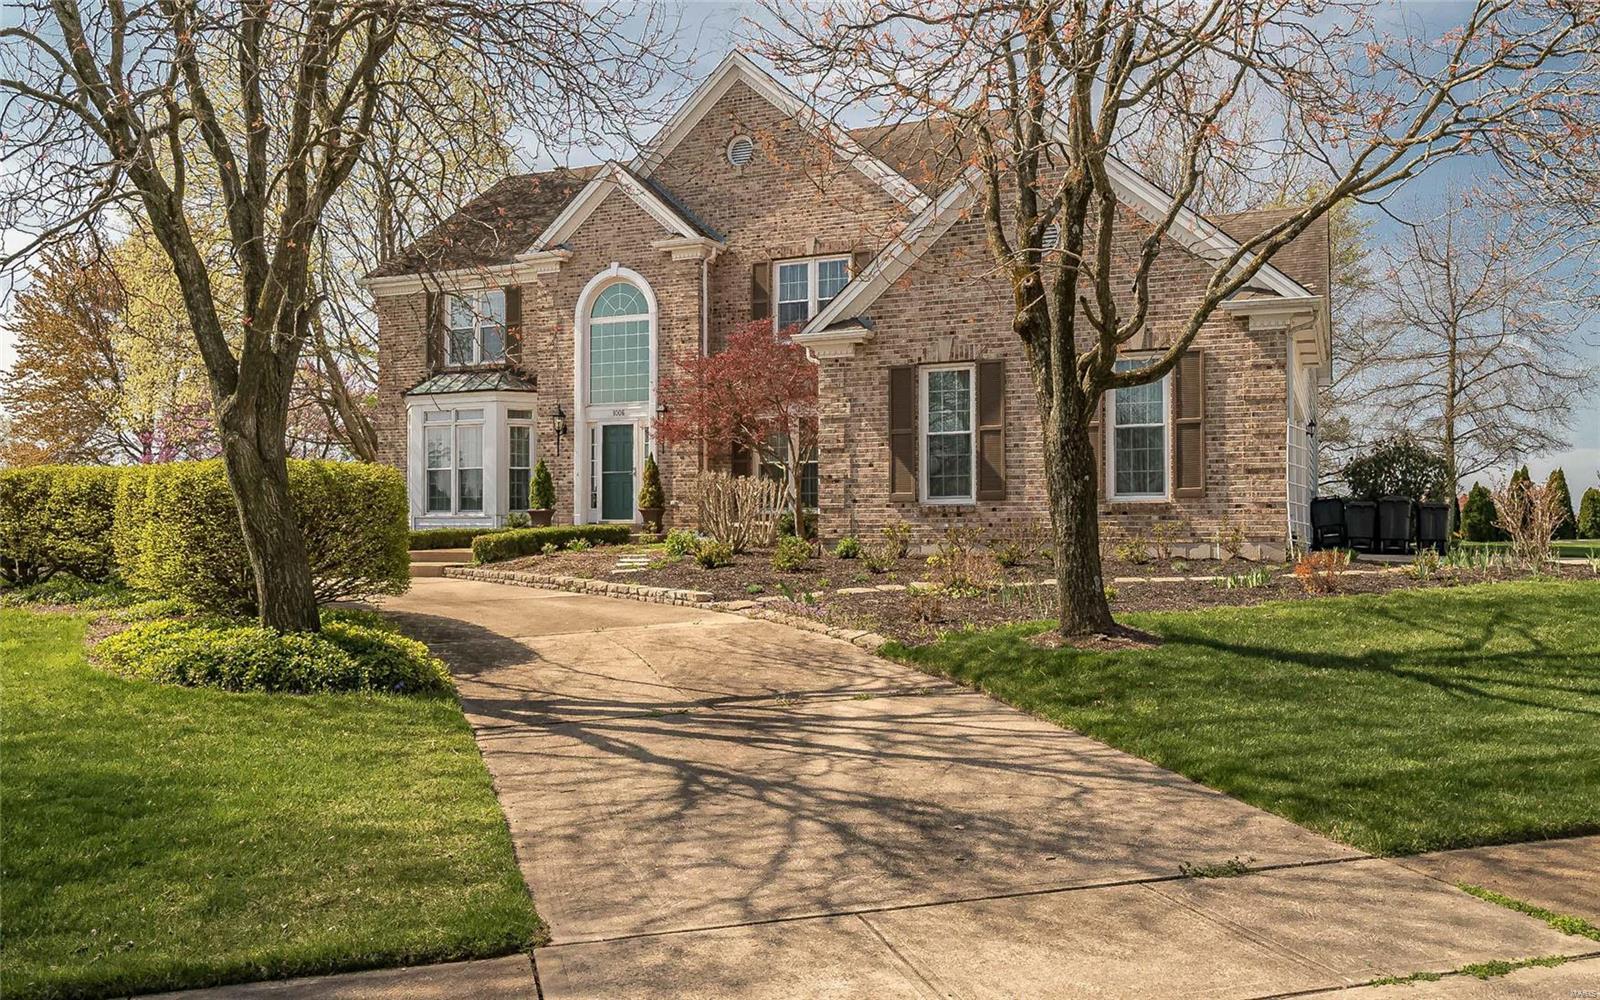 1006 Regency Manor Drive Property Photo - Ballwin, MO real estate listing